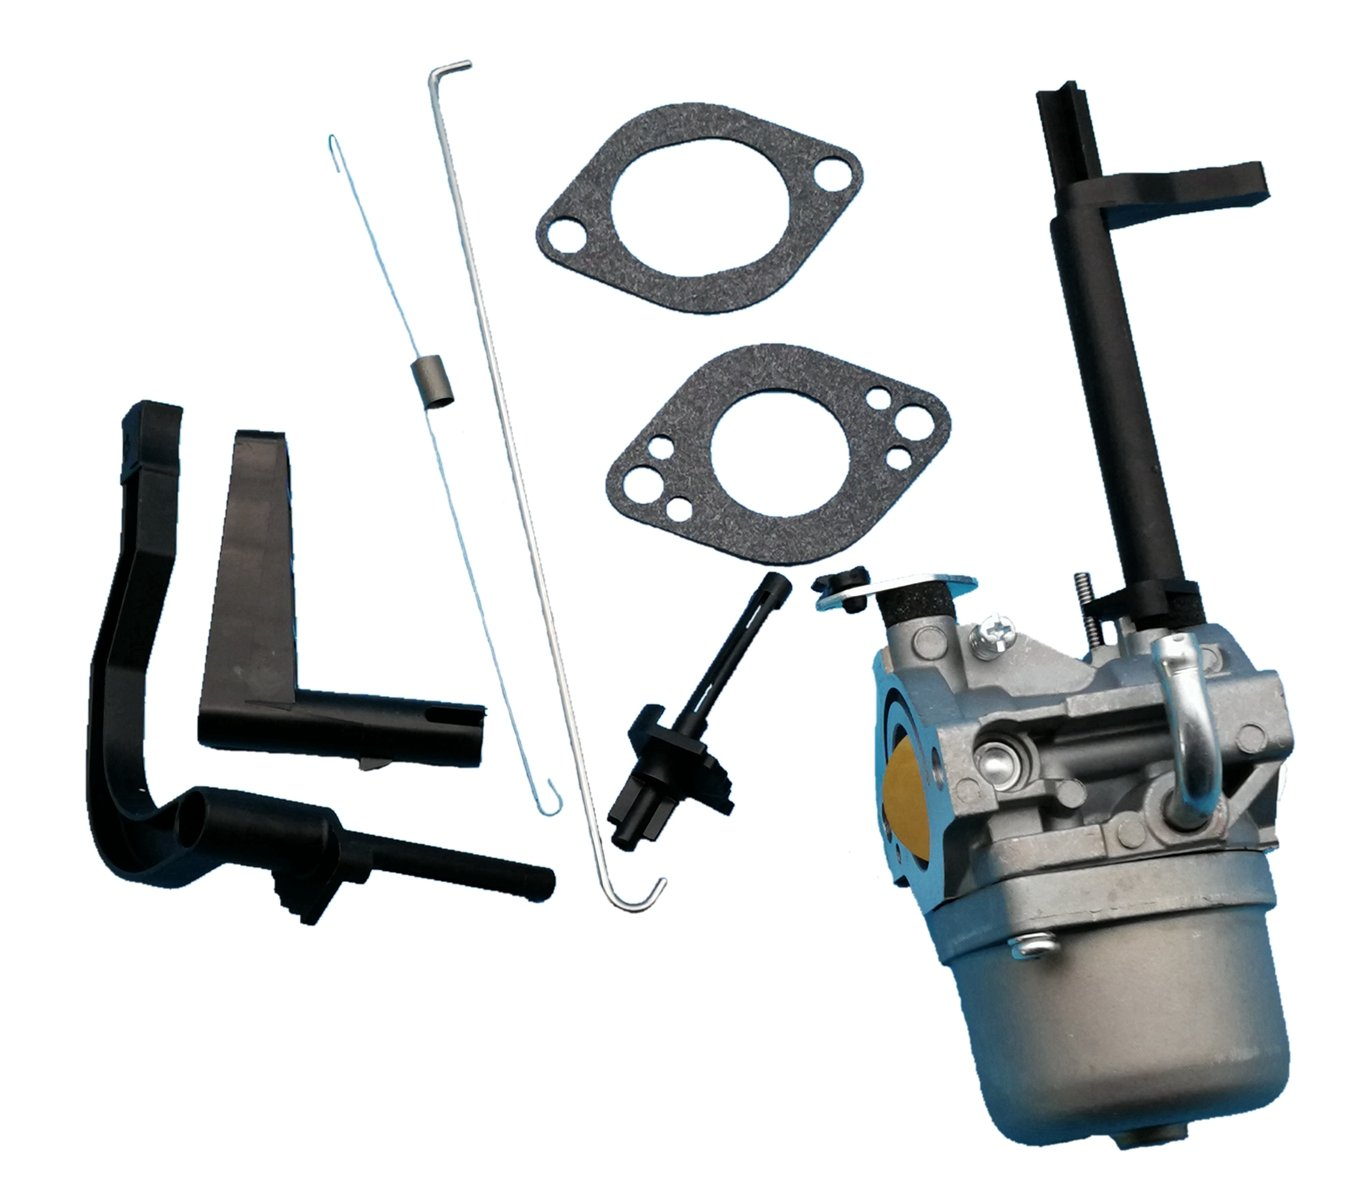 Tuzliufi Replace Carburetor Carb Briggs and Stratton B&S B & S Coleman Powermate 5000 5550 6200 8550 6250 10HP Craftsman 5600 8600 Troy-Bilt Generator 591378 694952 695328 695330 695918 695919 Z11